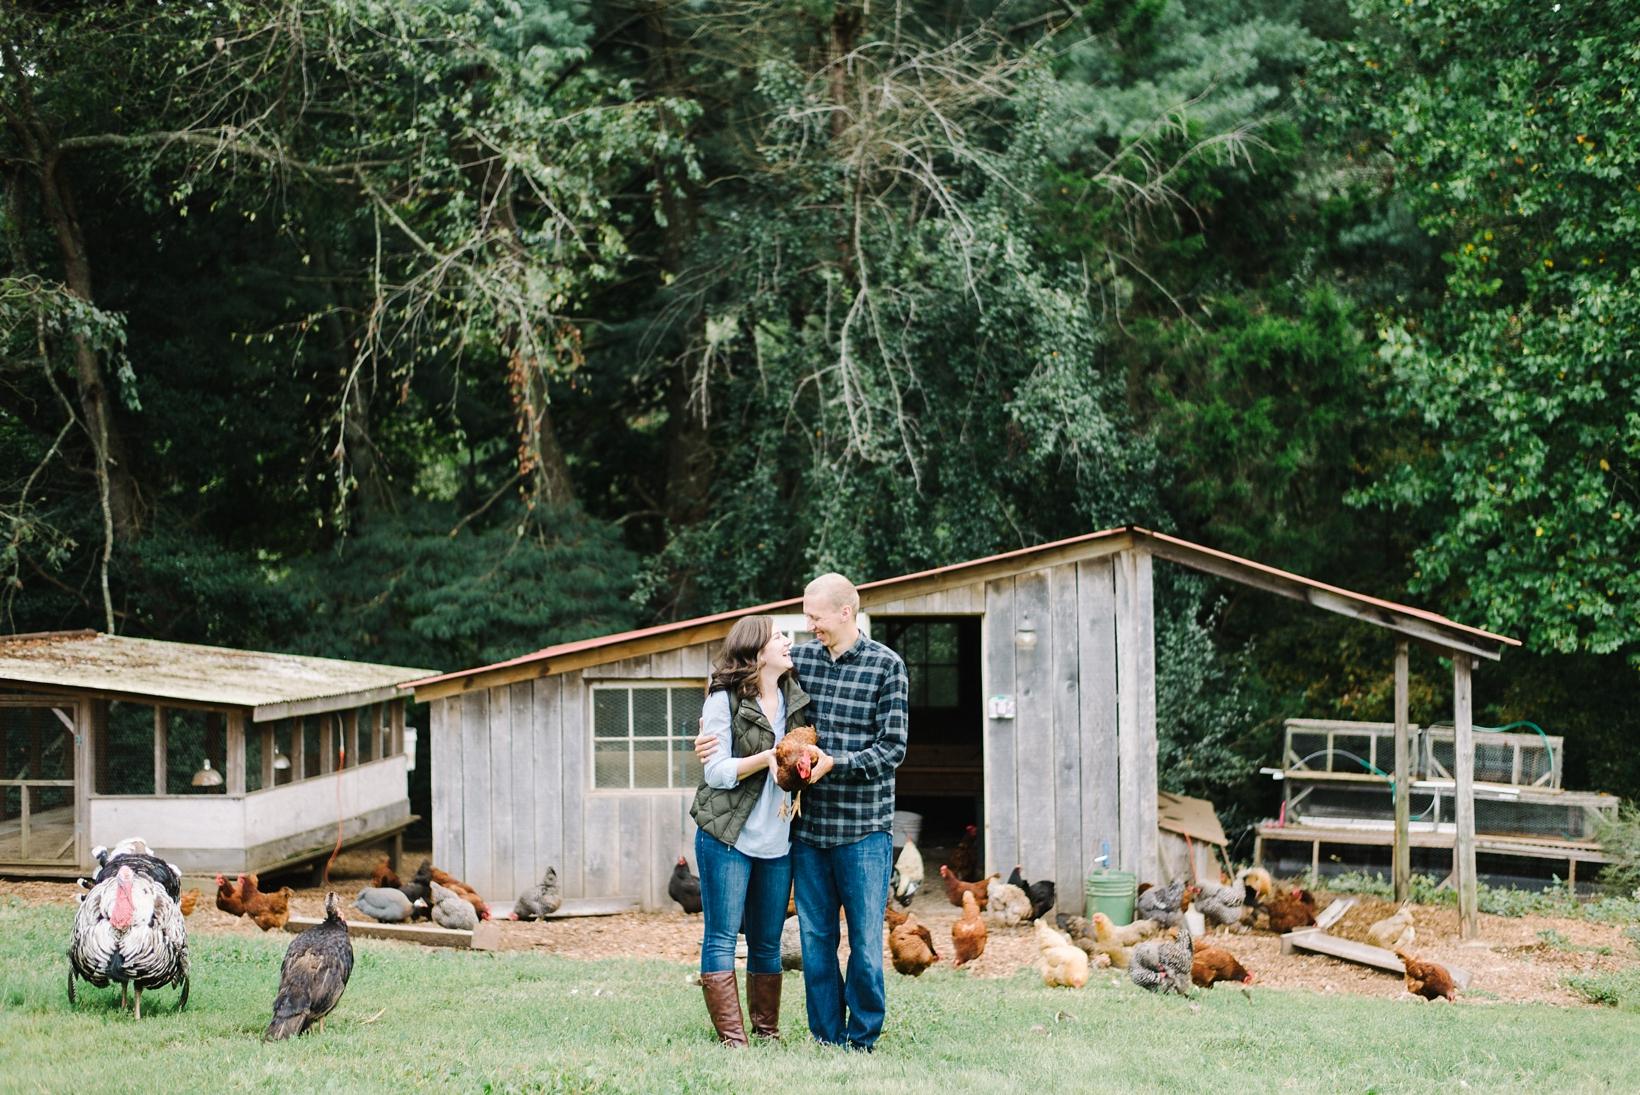 charlottesville wedding photographer, rustic charlottesville engagement_0017